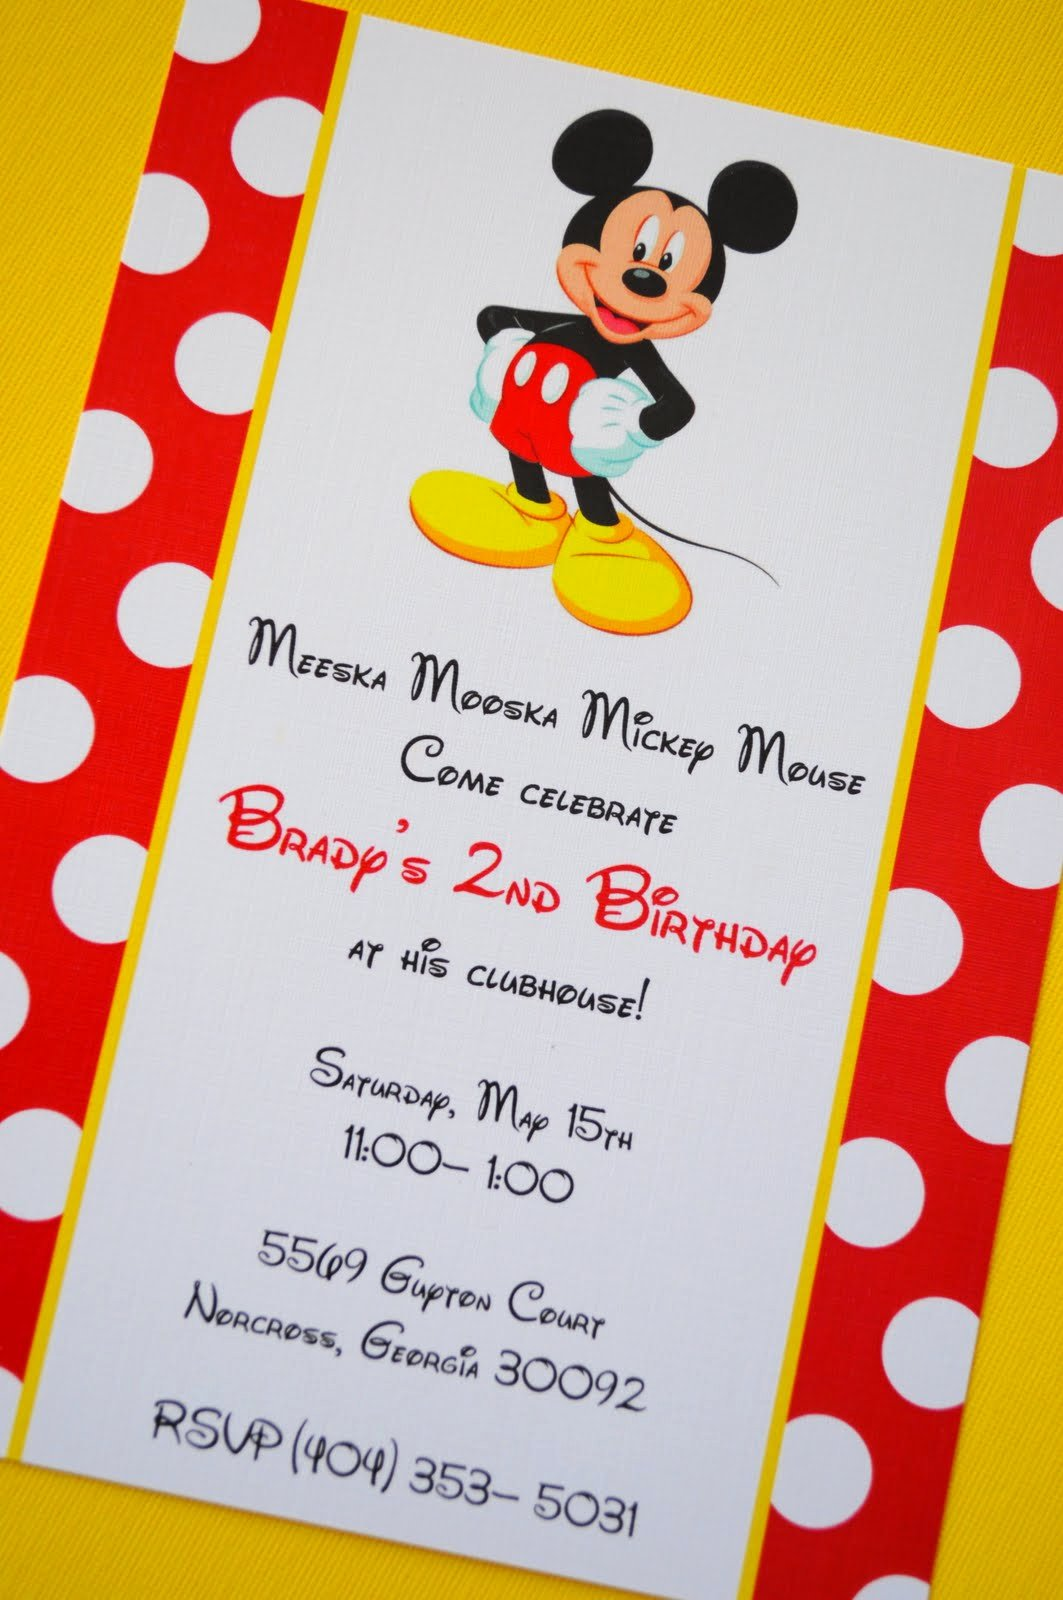 Mickey Mouse Birthday Invitations Wording Best Of Mickey Mouse Birthday Invitations Ideas and Template